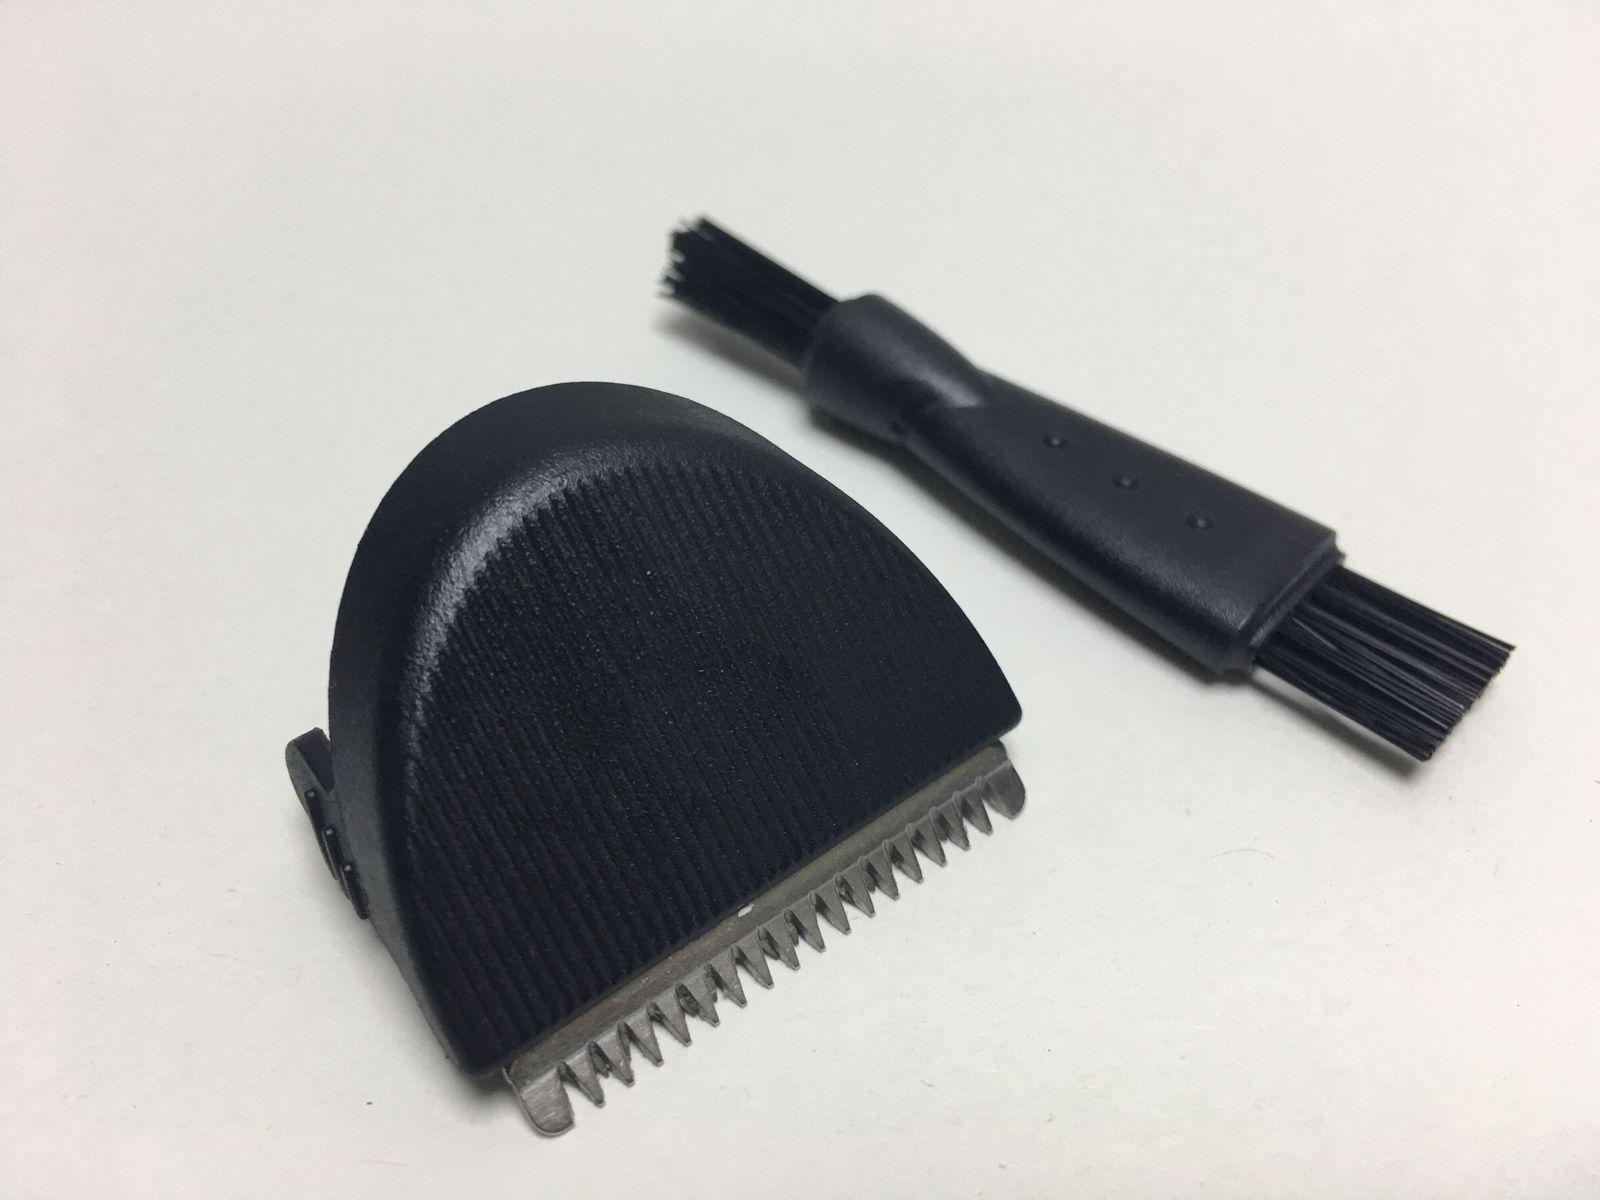 New Hair Clipper Trimmer Head Cutter Blade Razor For Philips COMB QT4040 QT4045 - $21.99